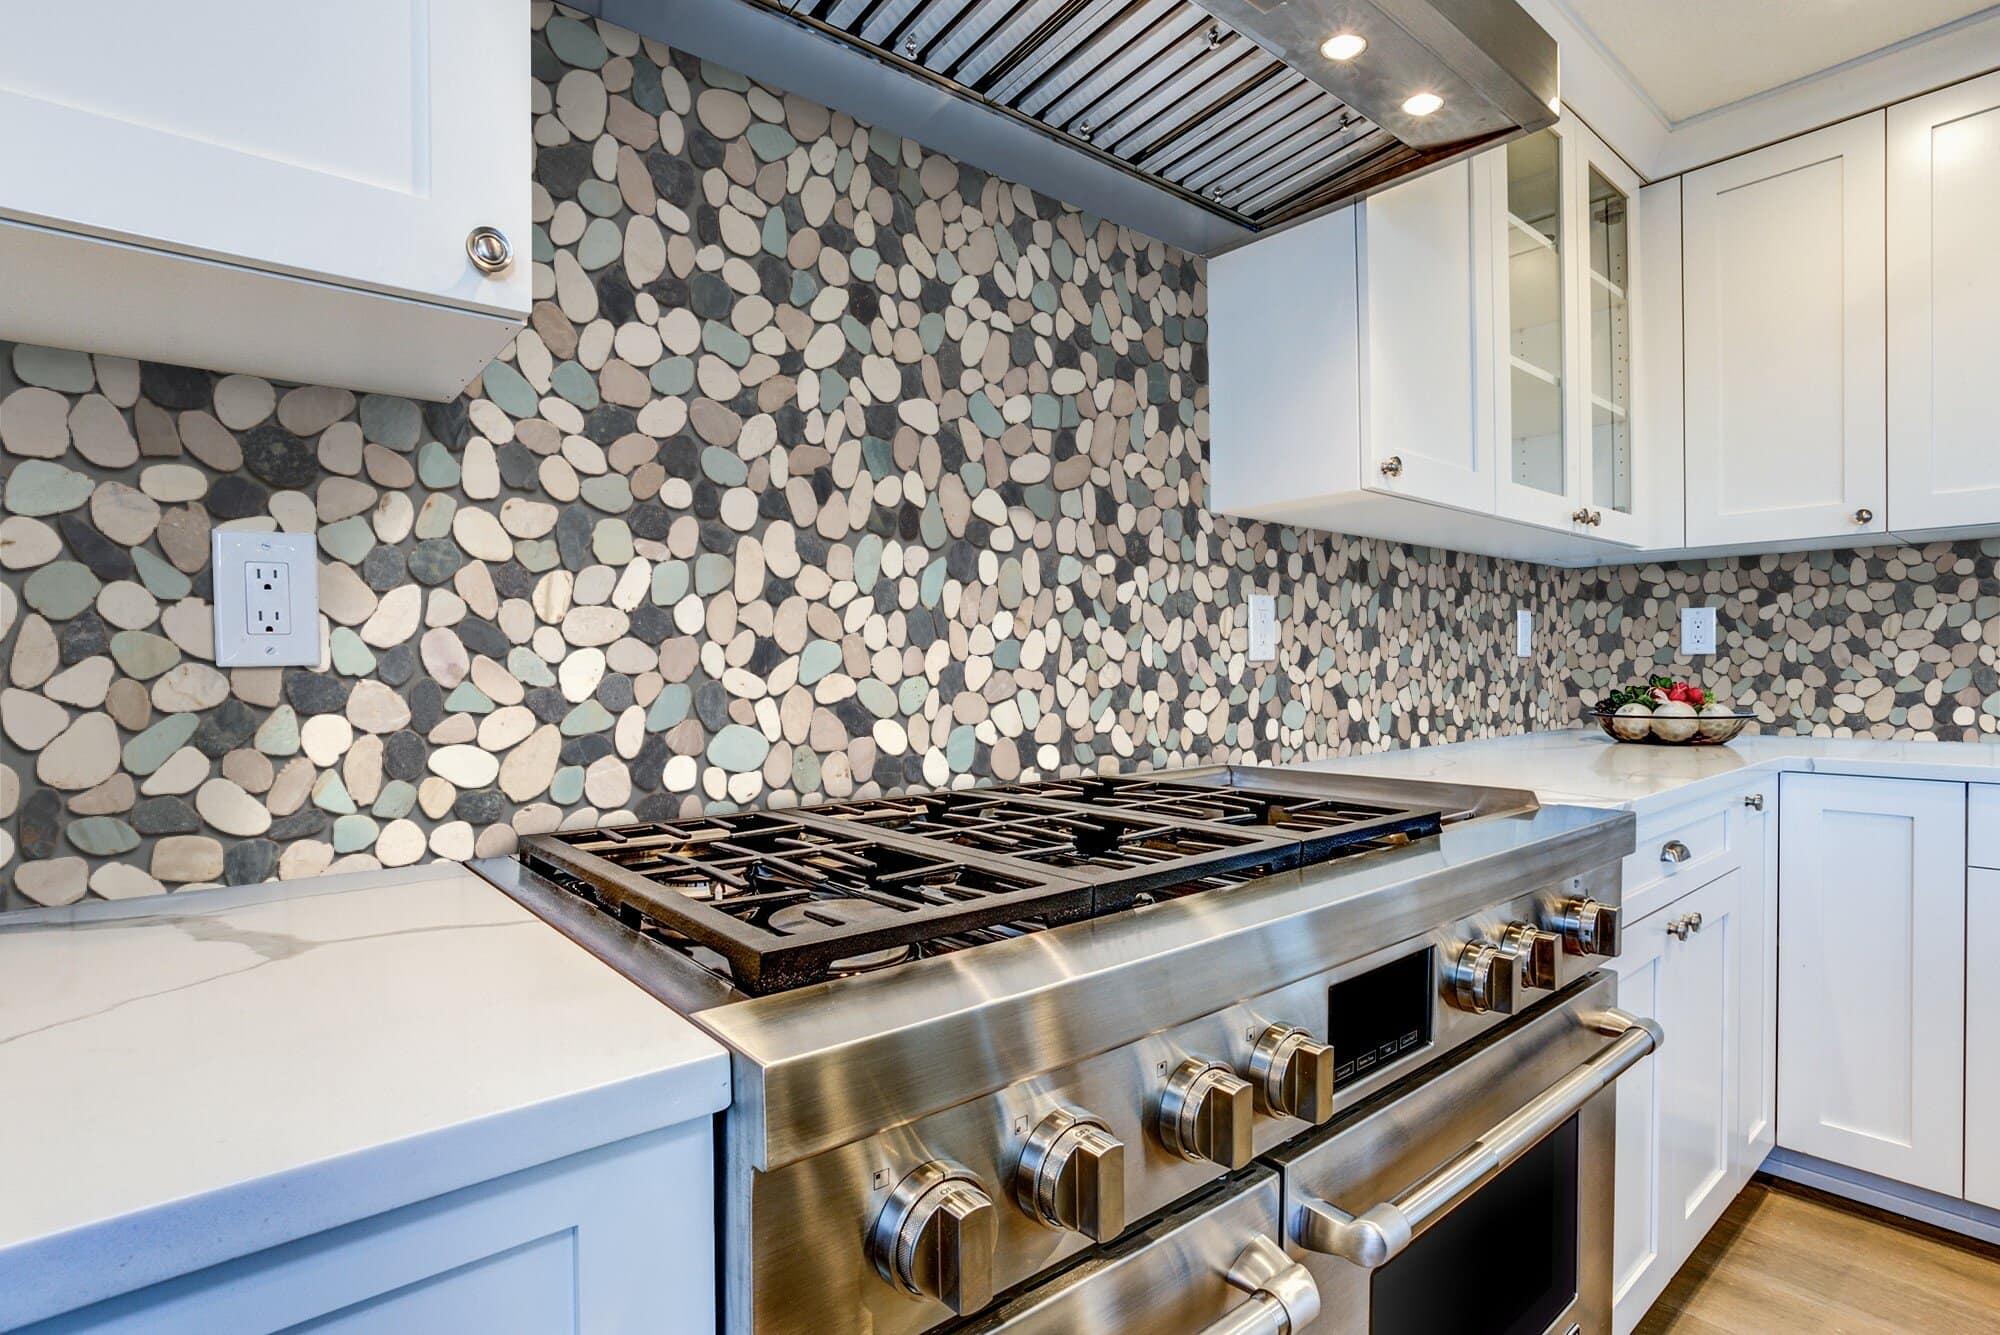 Use Pebble Tiles to Create a Rustic Kitchen Backsplash